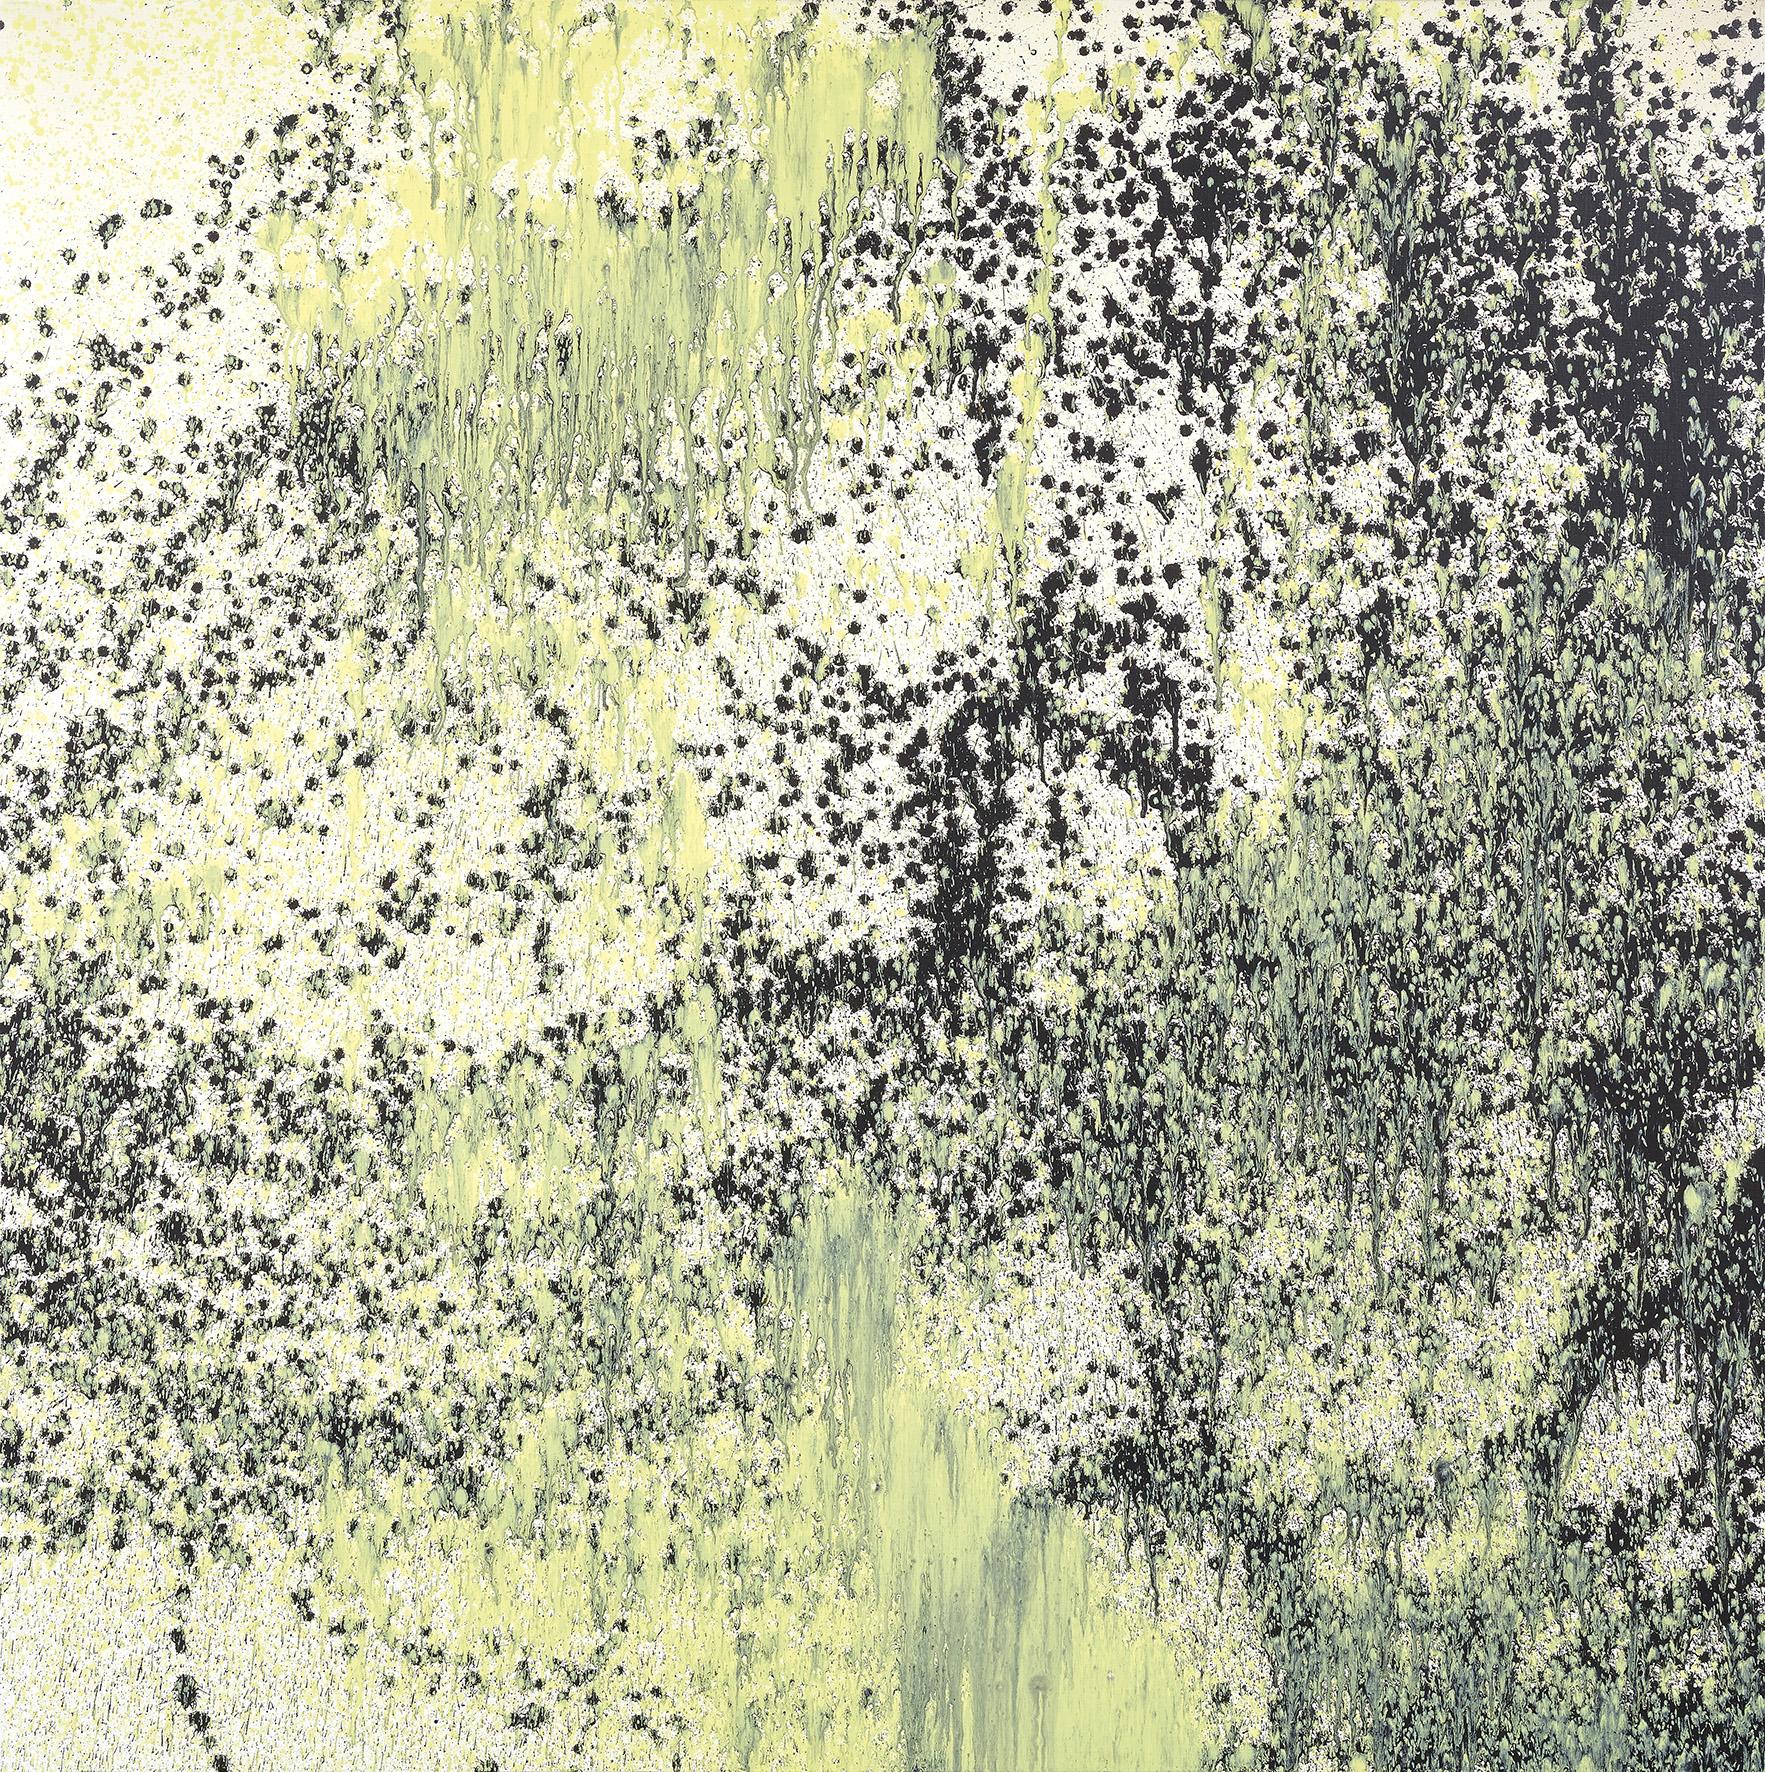 Hans Hartung, T 1989-H5, 1989, acrylic on canvas, 180 x 180 cm, estimate € 90.000 – 120.000